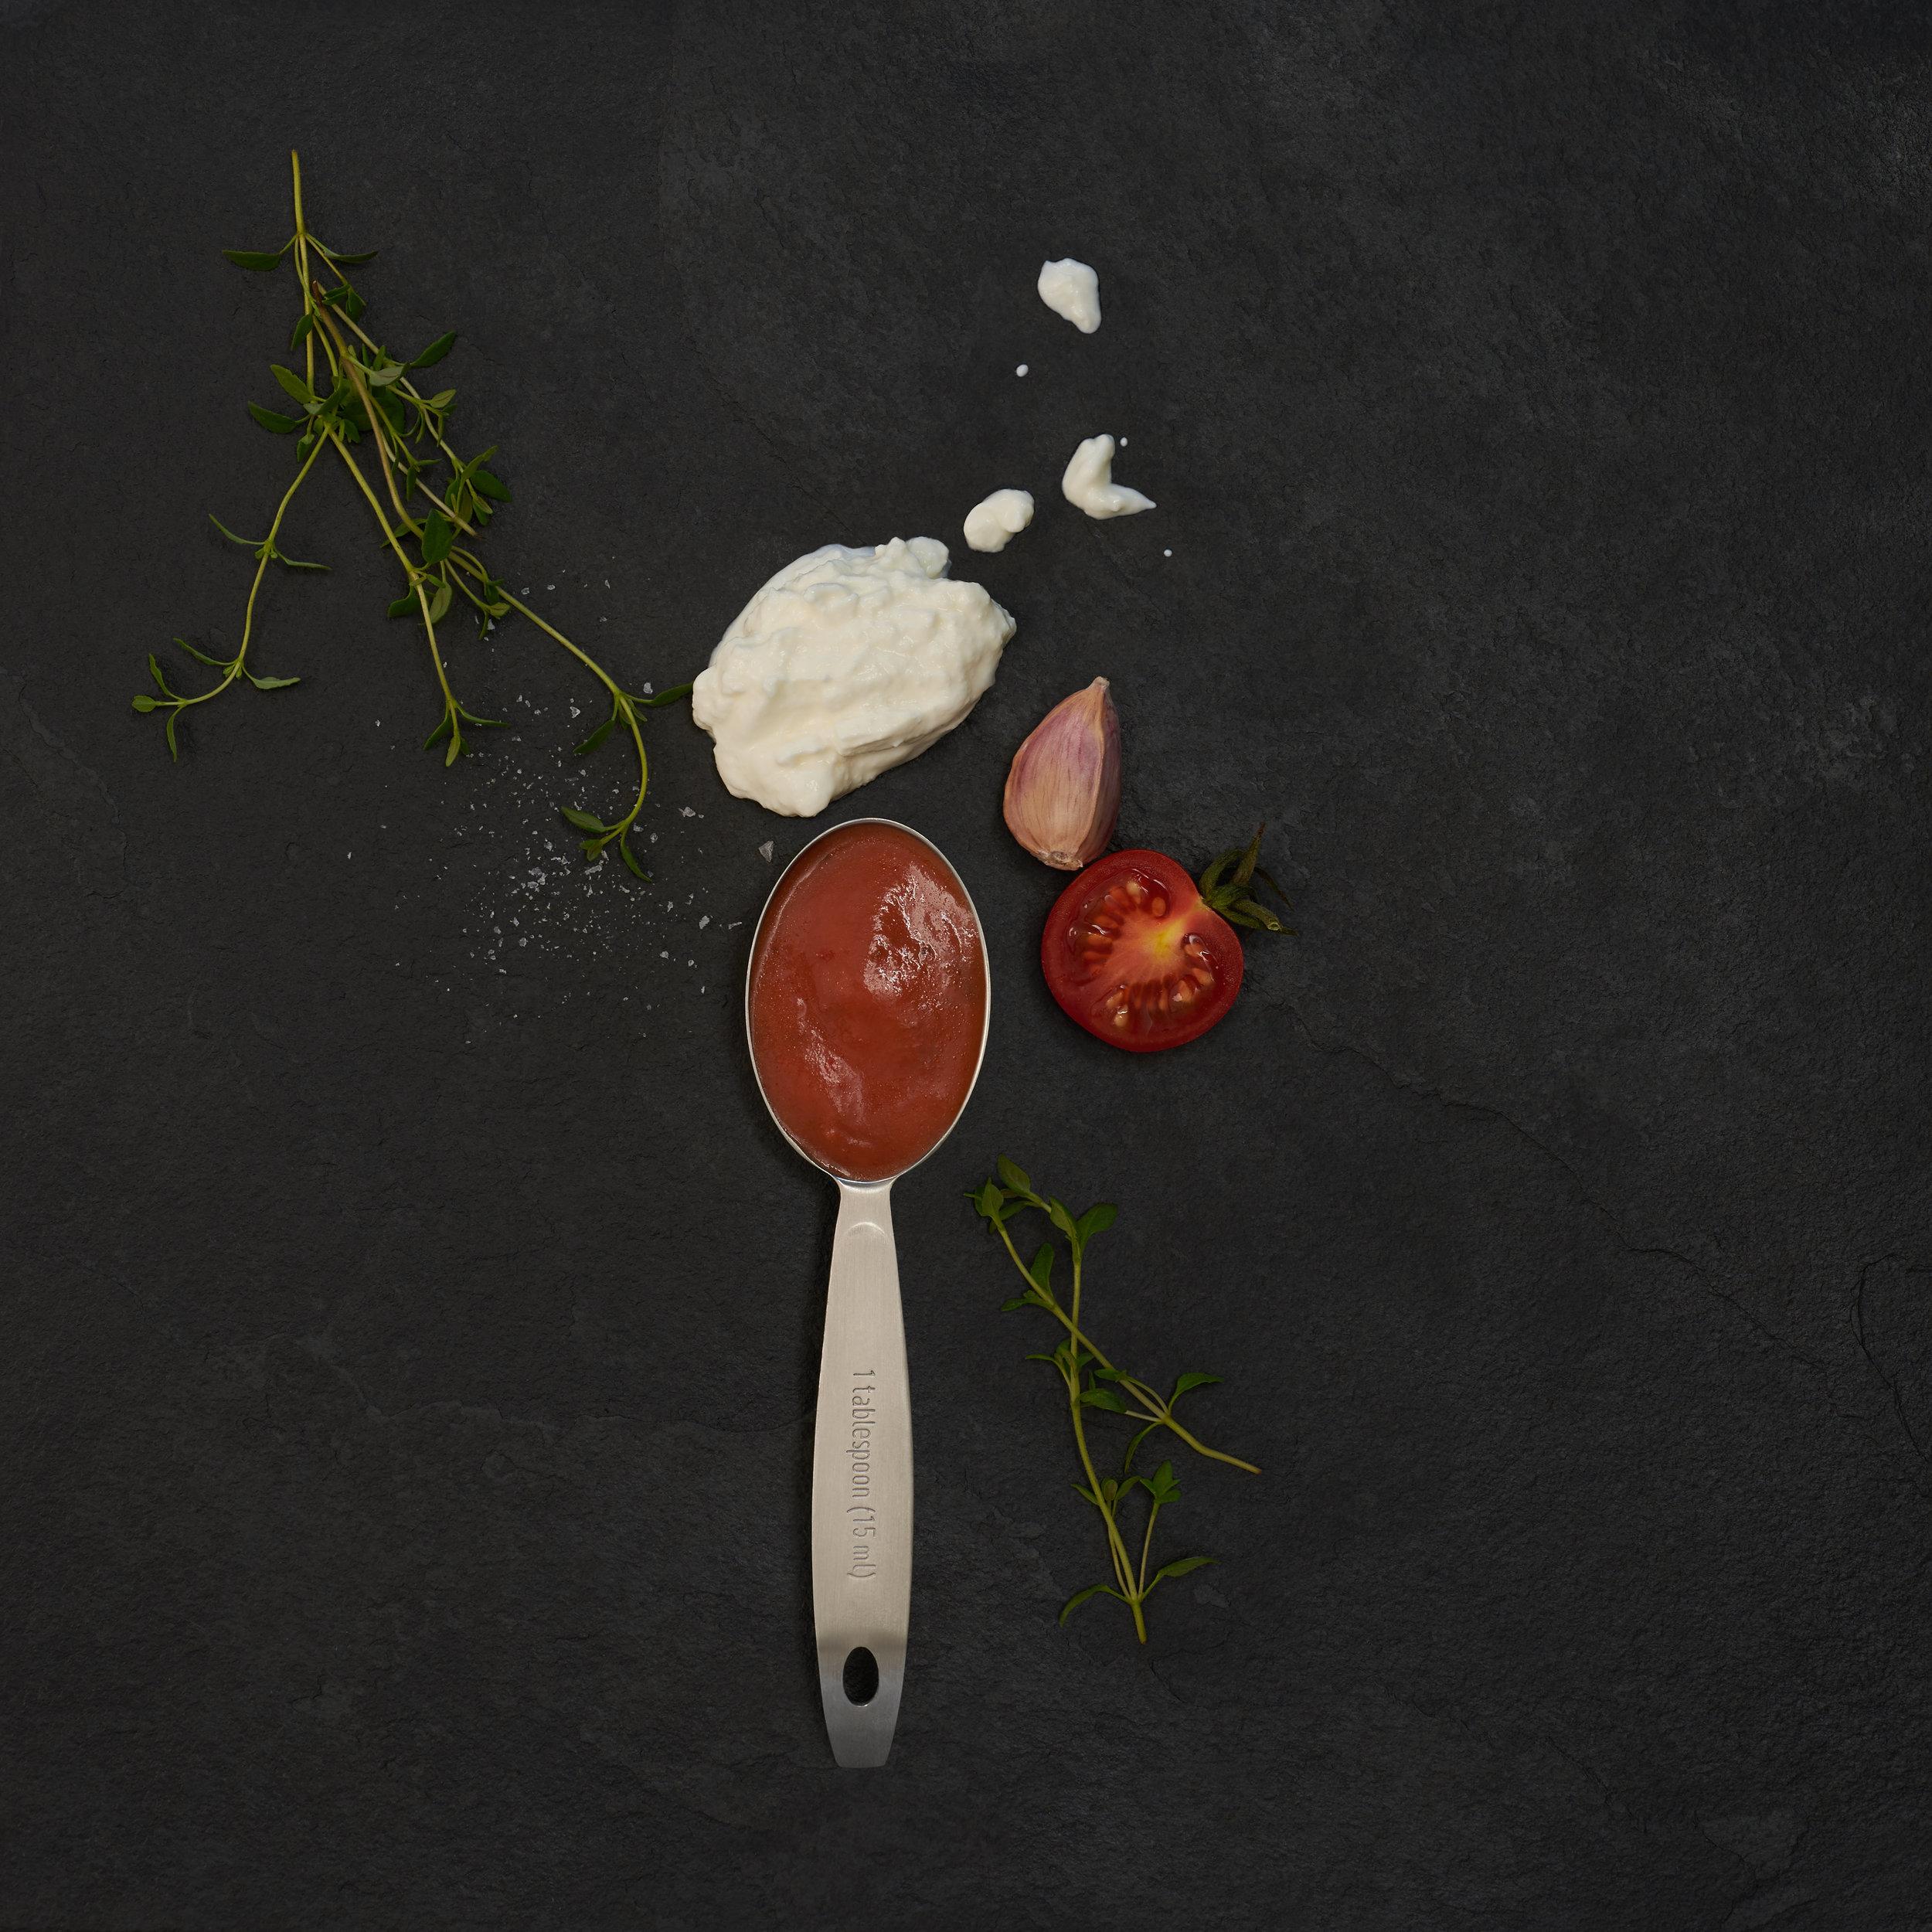 KitchenLab_Orfe_1724434_Rose2_VF copie.jpg